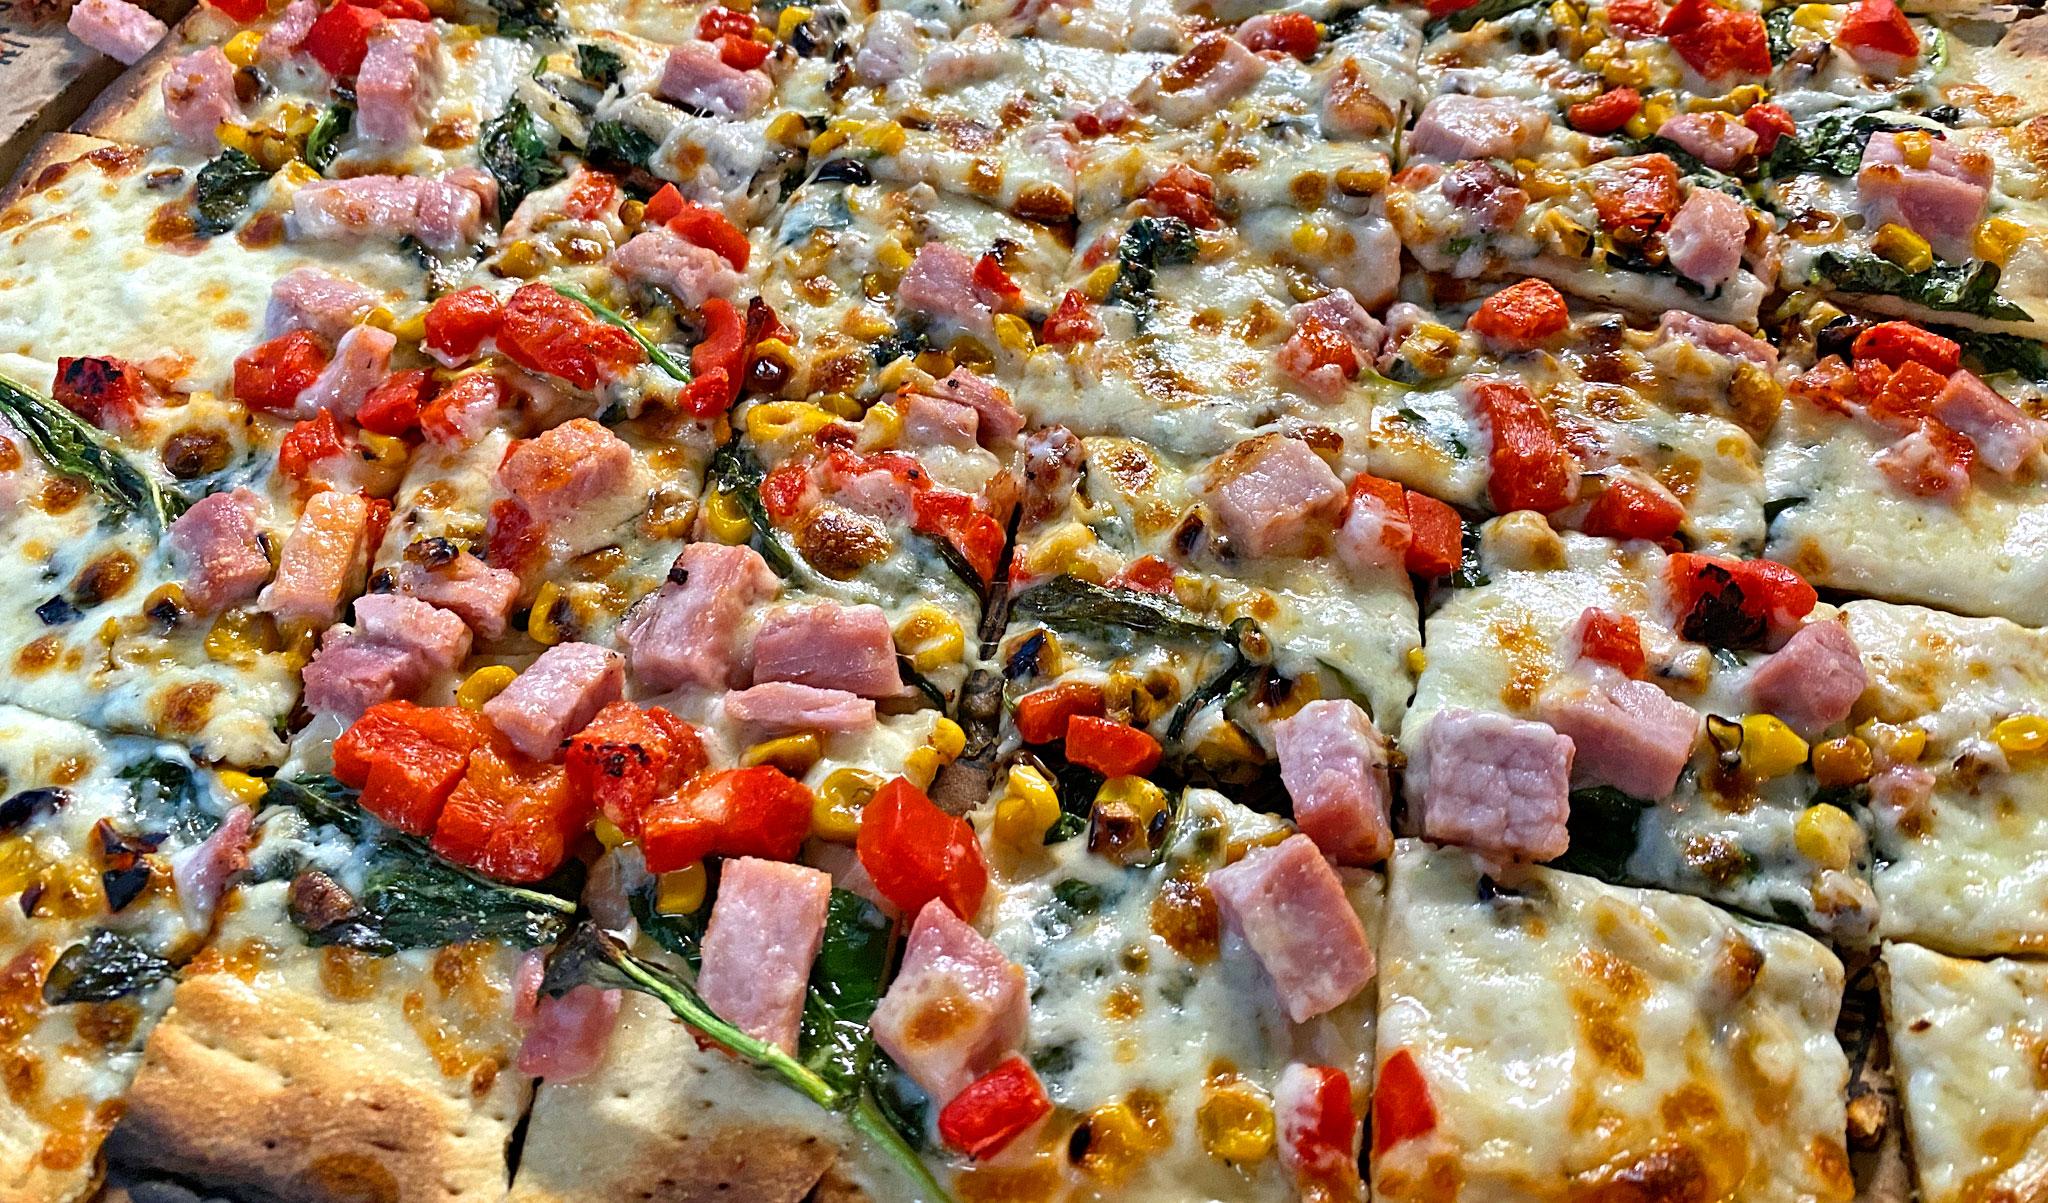 Cornholio Ohio Pizza